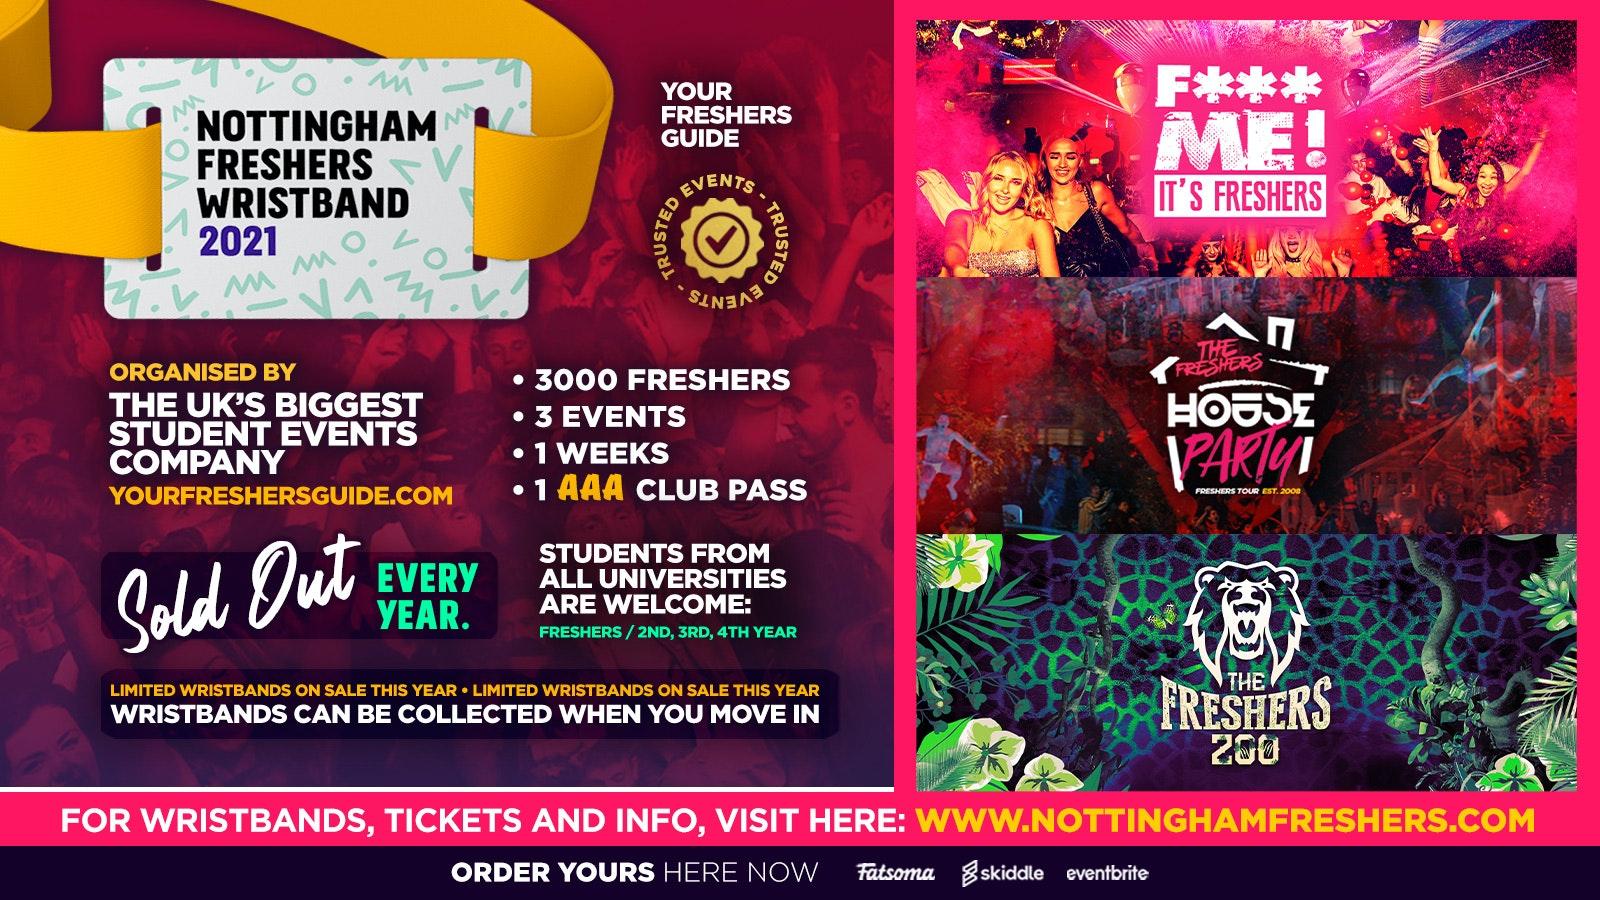 Nottingham Freshers Wristband 2021 – Returners Tickets!